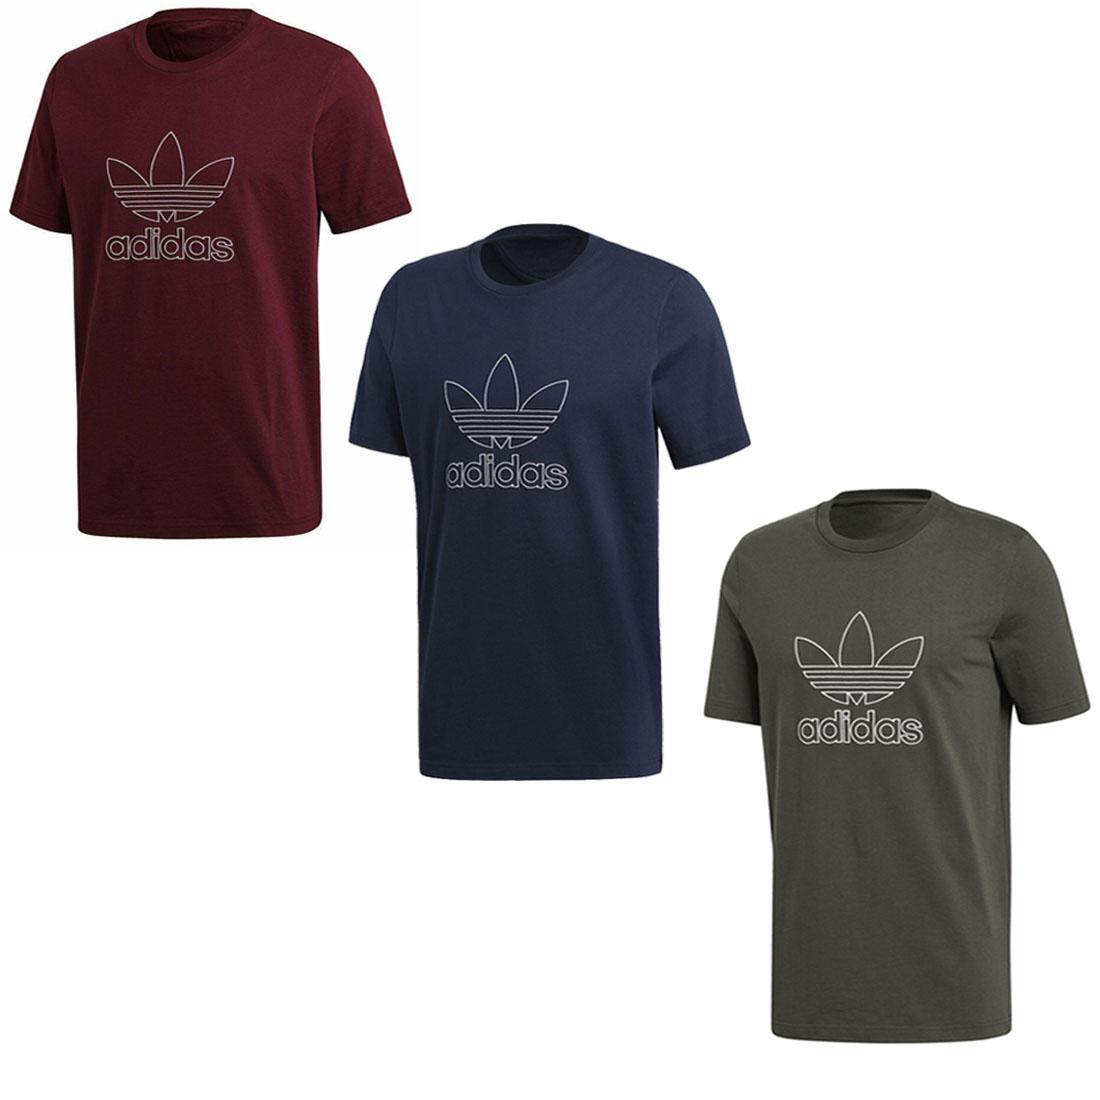 Detalles de Adidas Originals Contorno Camiseta Hombre Trébol Gimnasio Sports Moda Bordado